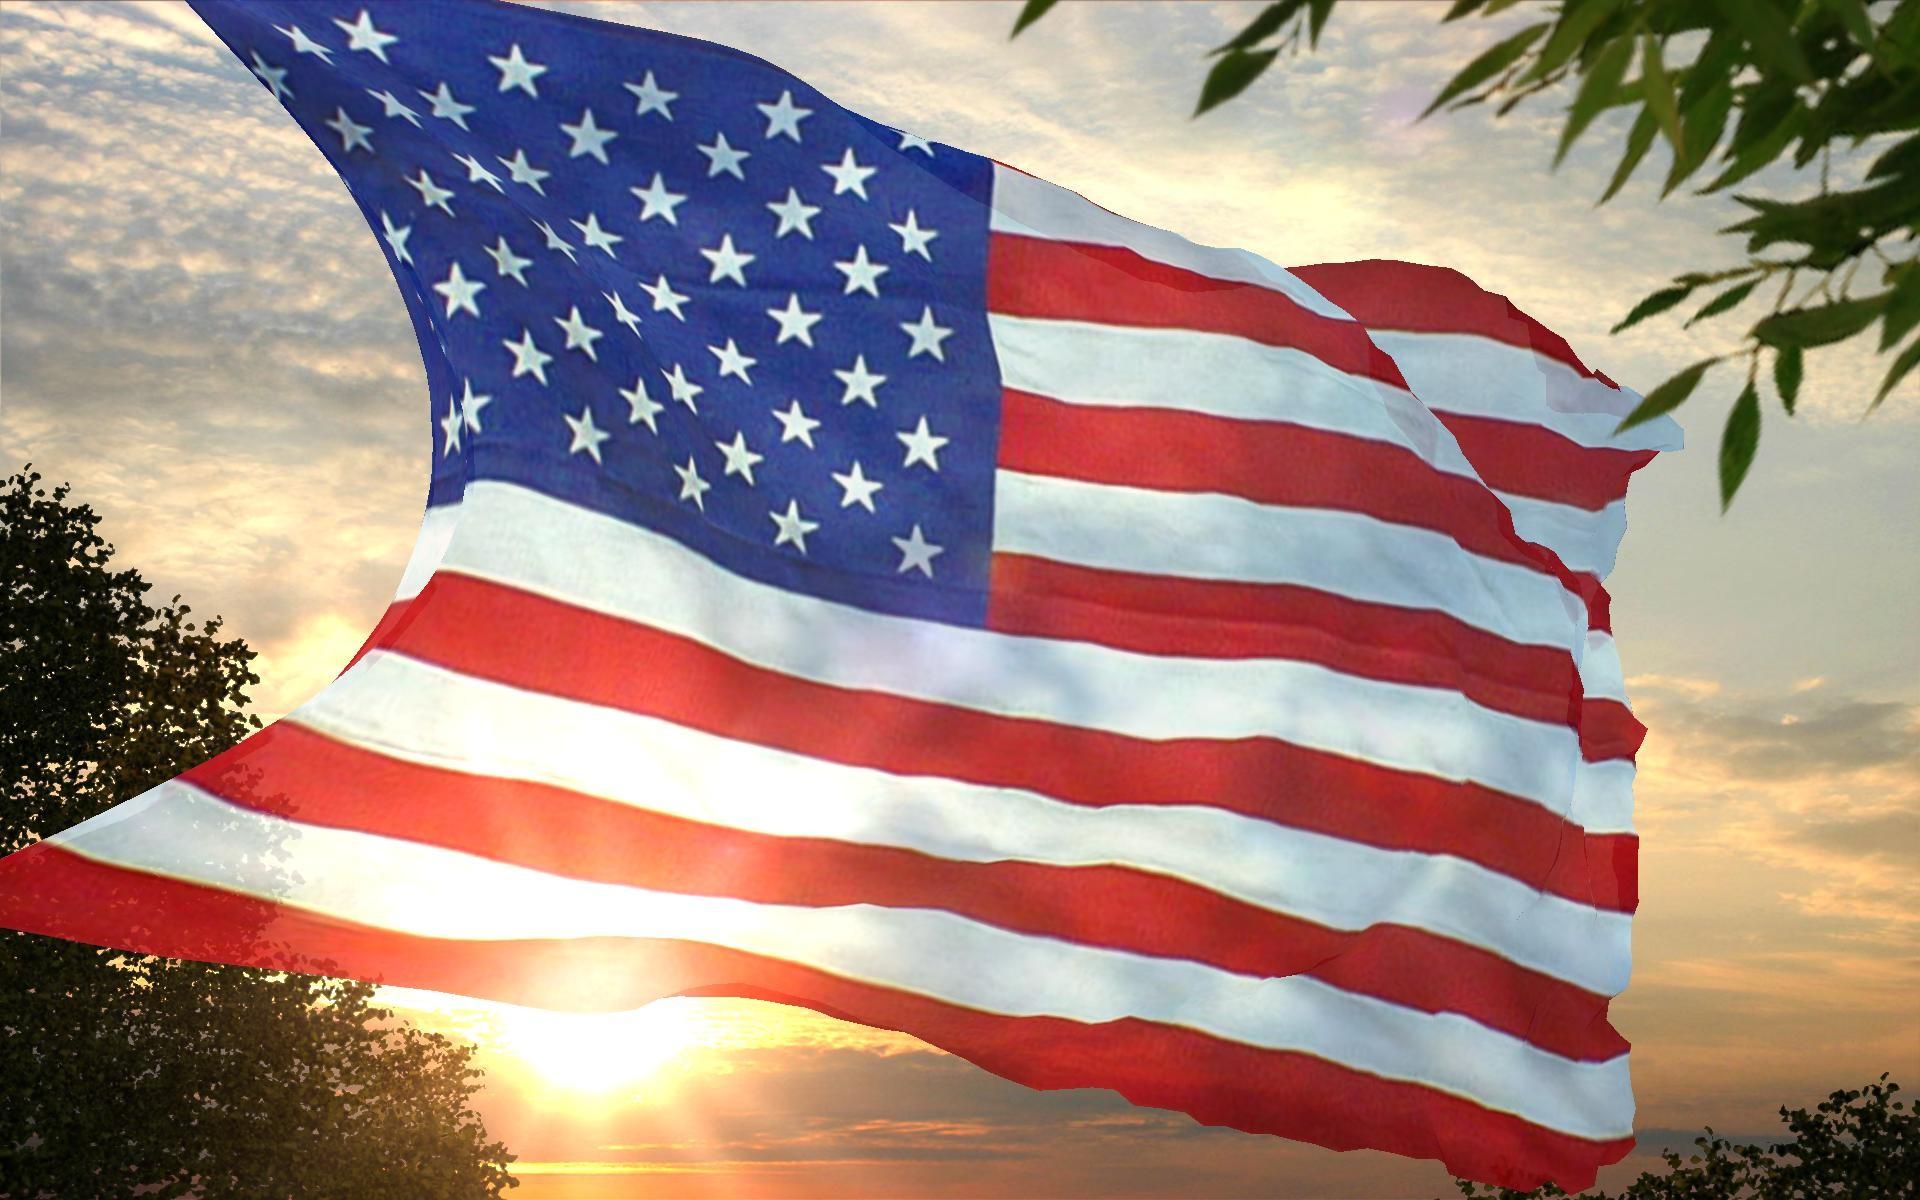 Related Wallpaper for USA American Flag Wallpaper